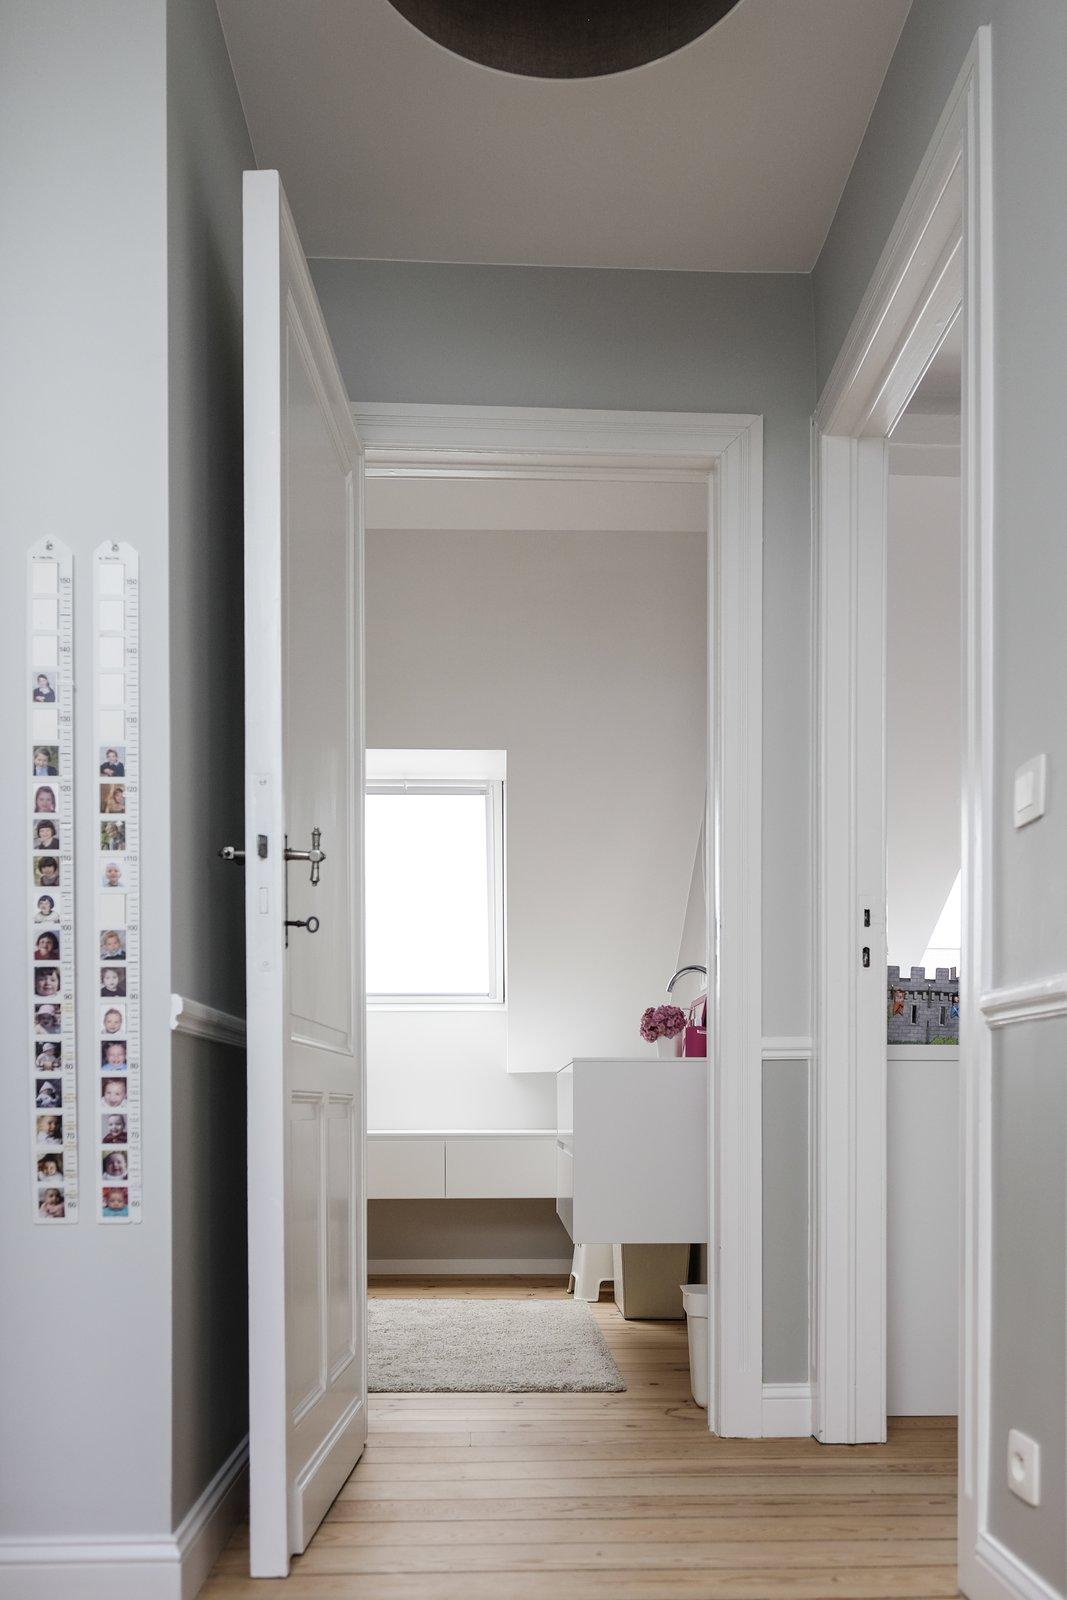 Bath, Light Hardwood, Ceramic Tile, Engineered Quartz, Drop In, Ceiling, and Enclosed The children floor  Best Bath Drop In Enclosed Ceramic Tile Photos from Maison de Maitre - Brussels